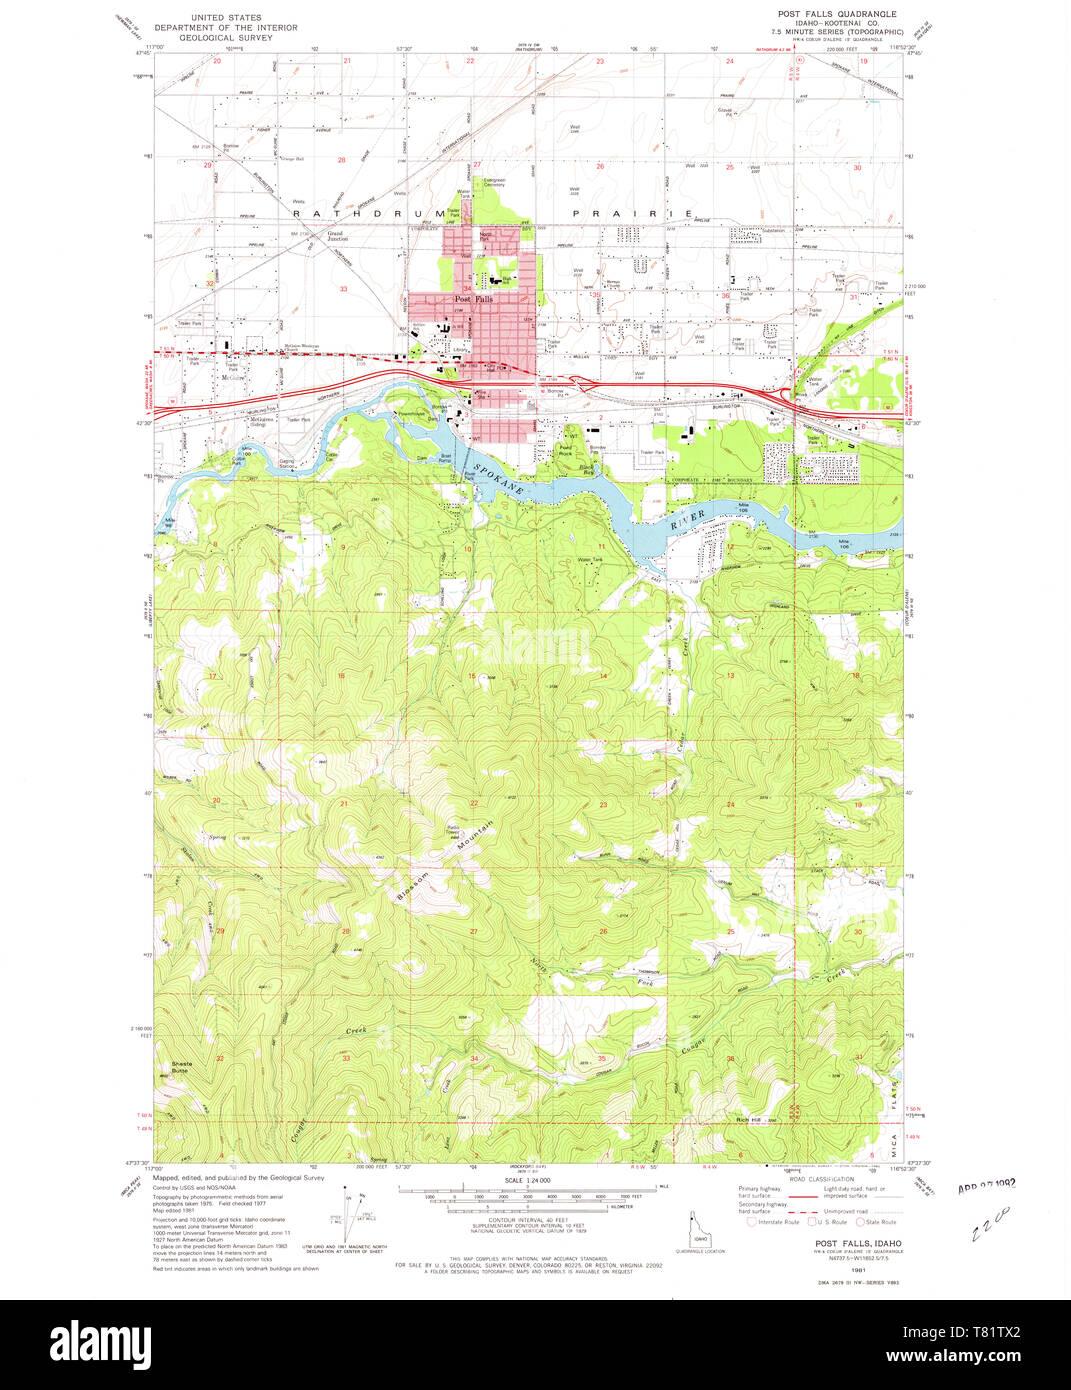 map of post falls idaho Usgs Topo Map Idaho Id Post Falls 237718 1981 24000 Restoration Stock Photo Alamy map of post falls idaho